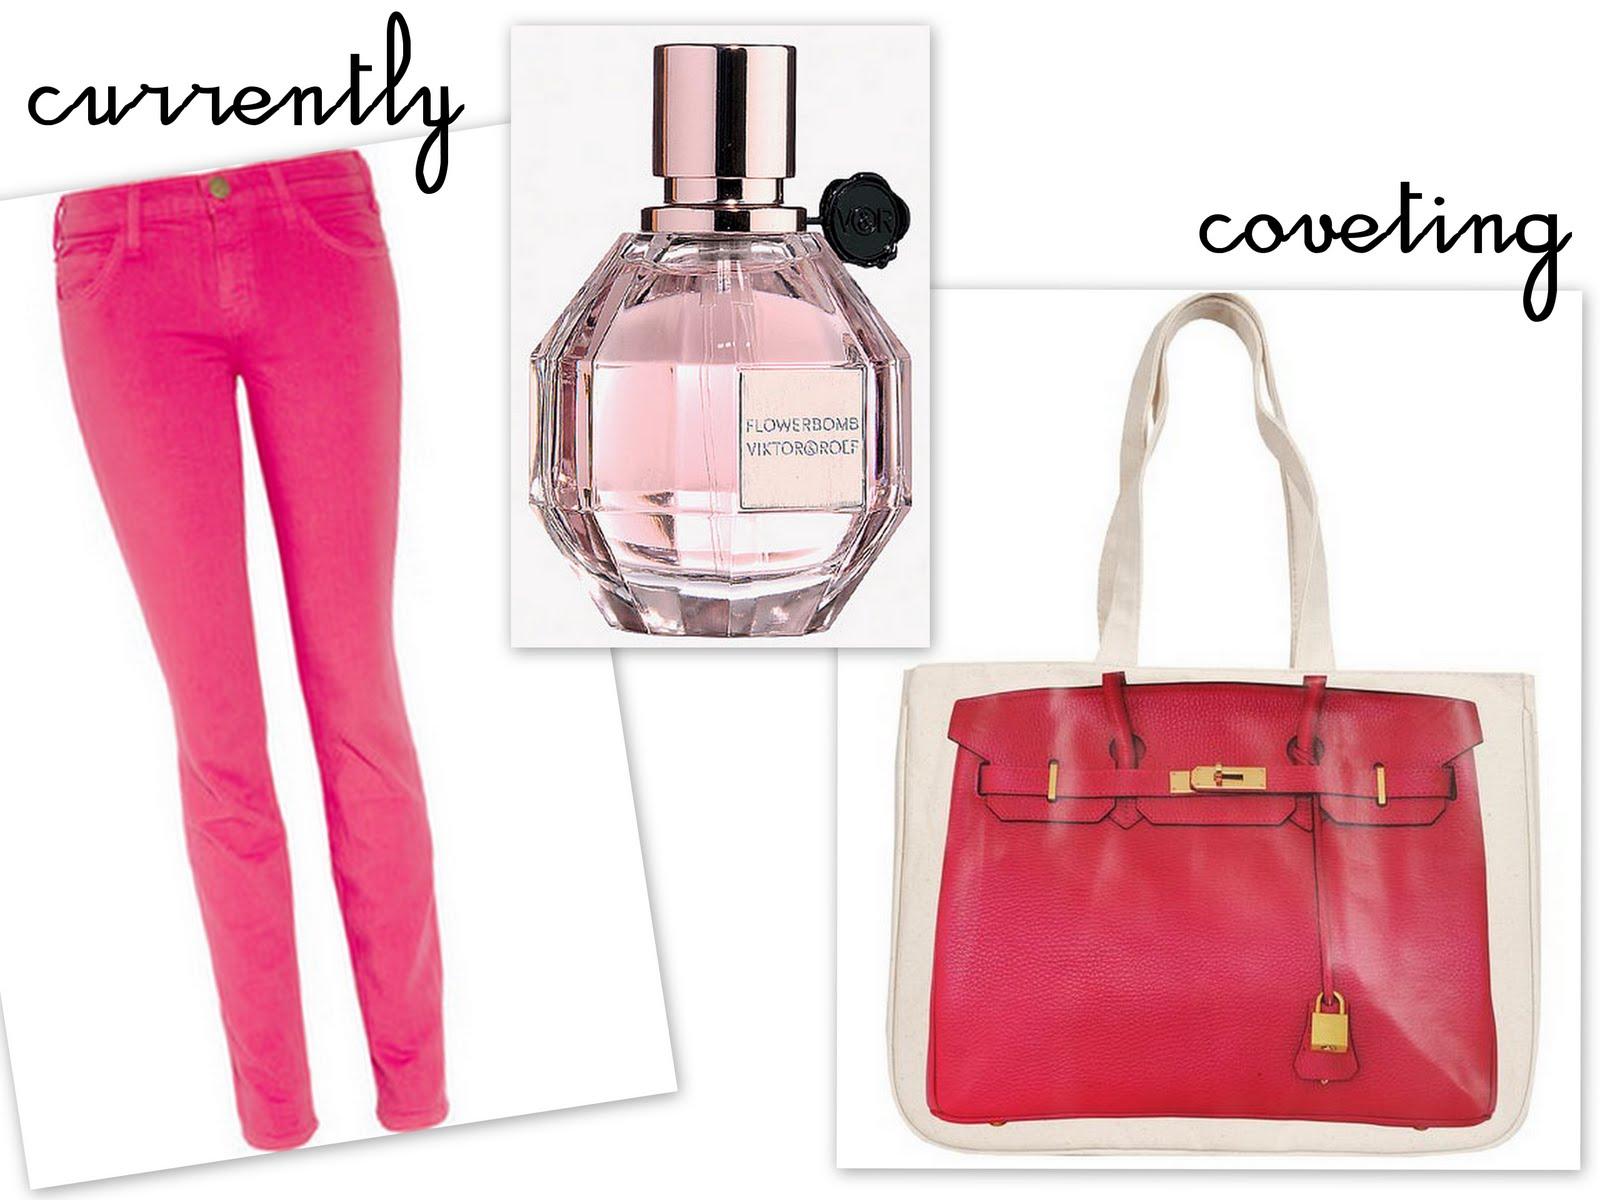 http://3.bp.blogspot.com/-M2fZ0aebOvY/ToDQUbu6h4I/AAAAAAAAIfA/7V9TZjNvjwc/s1600/CC+pink.jpg